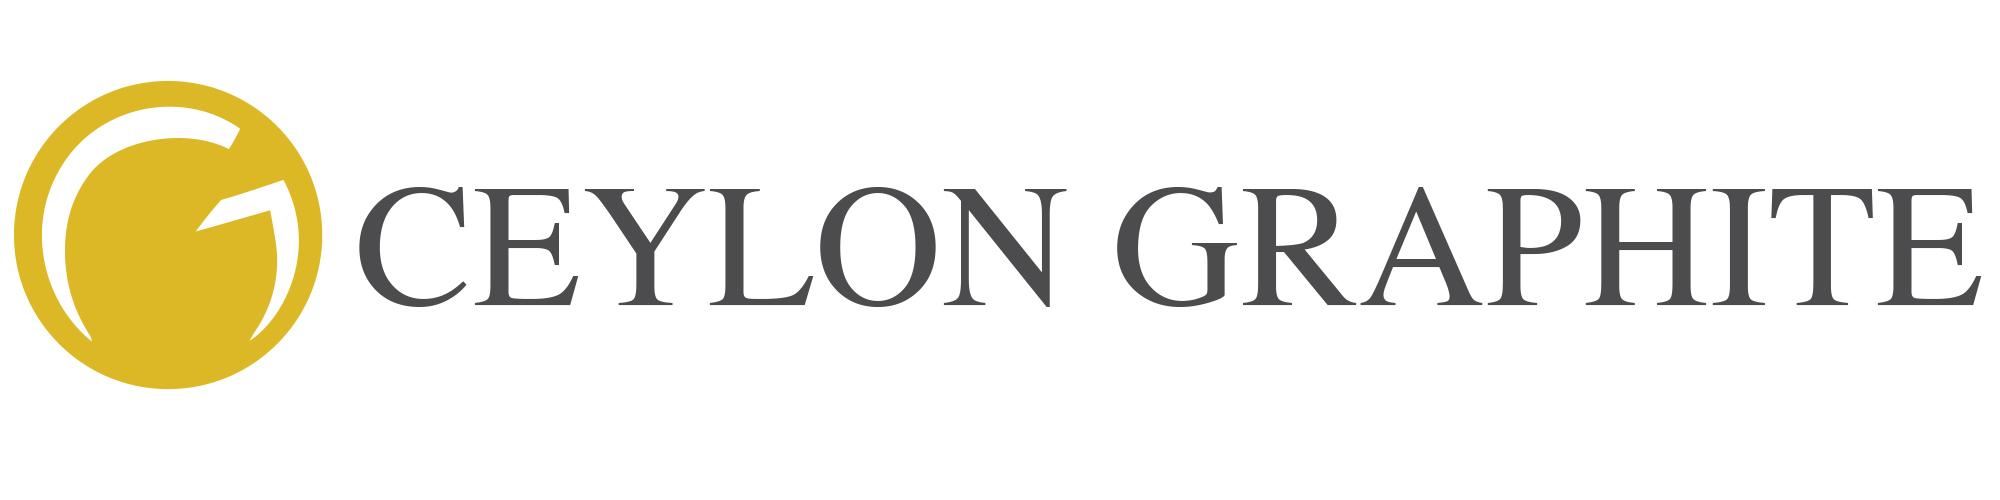 Ceylon Graphite Resumes Production